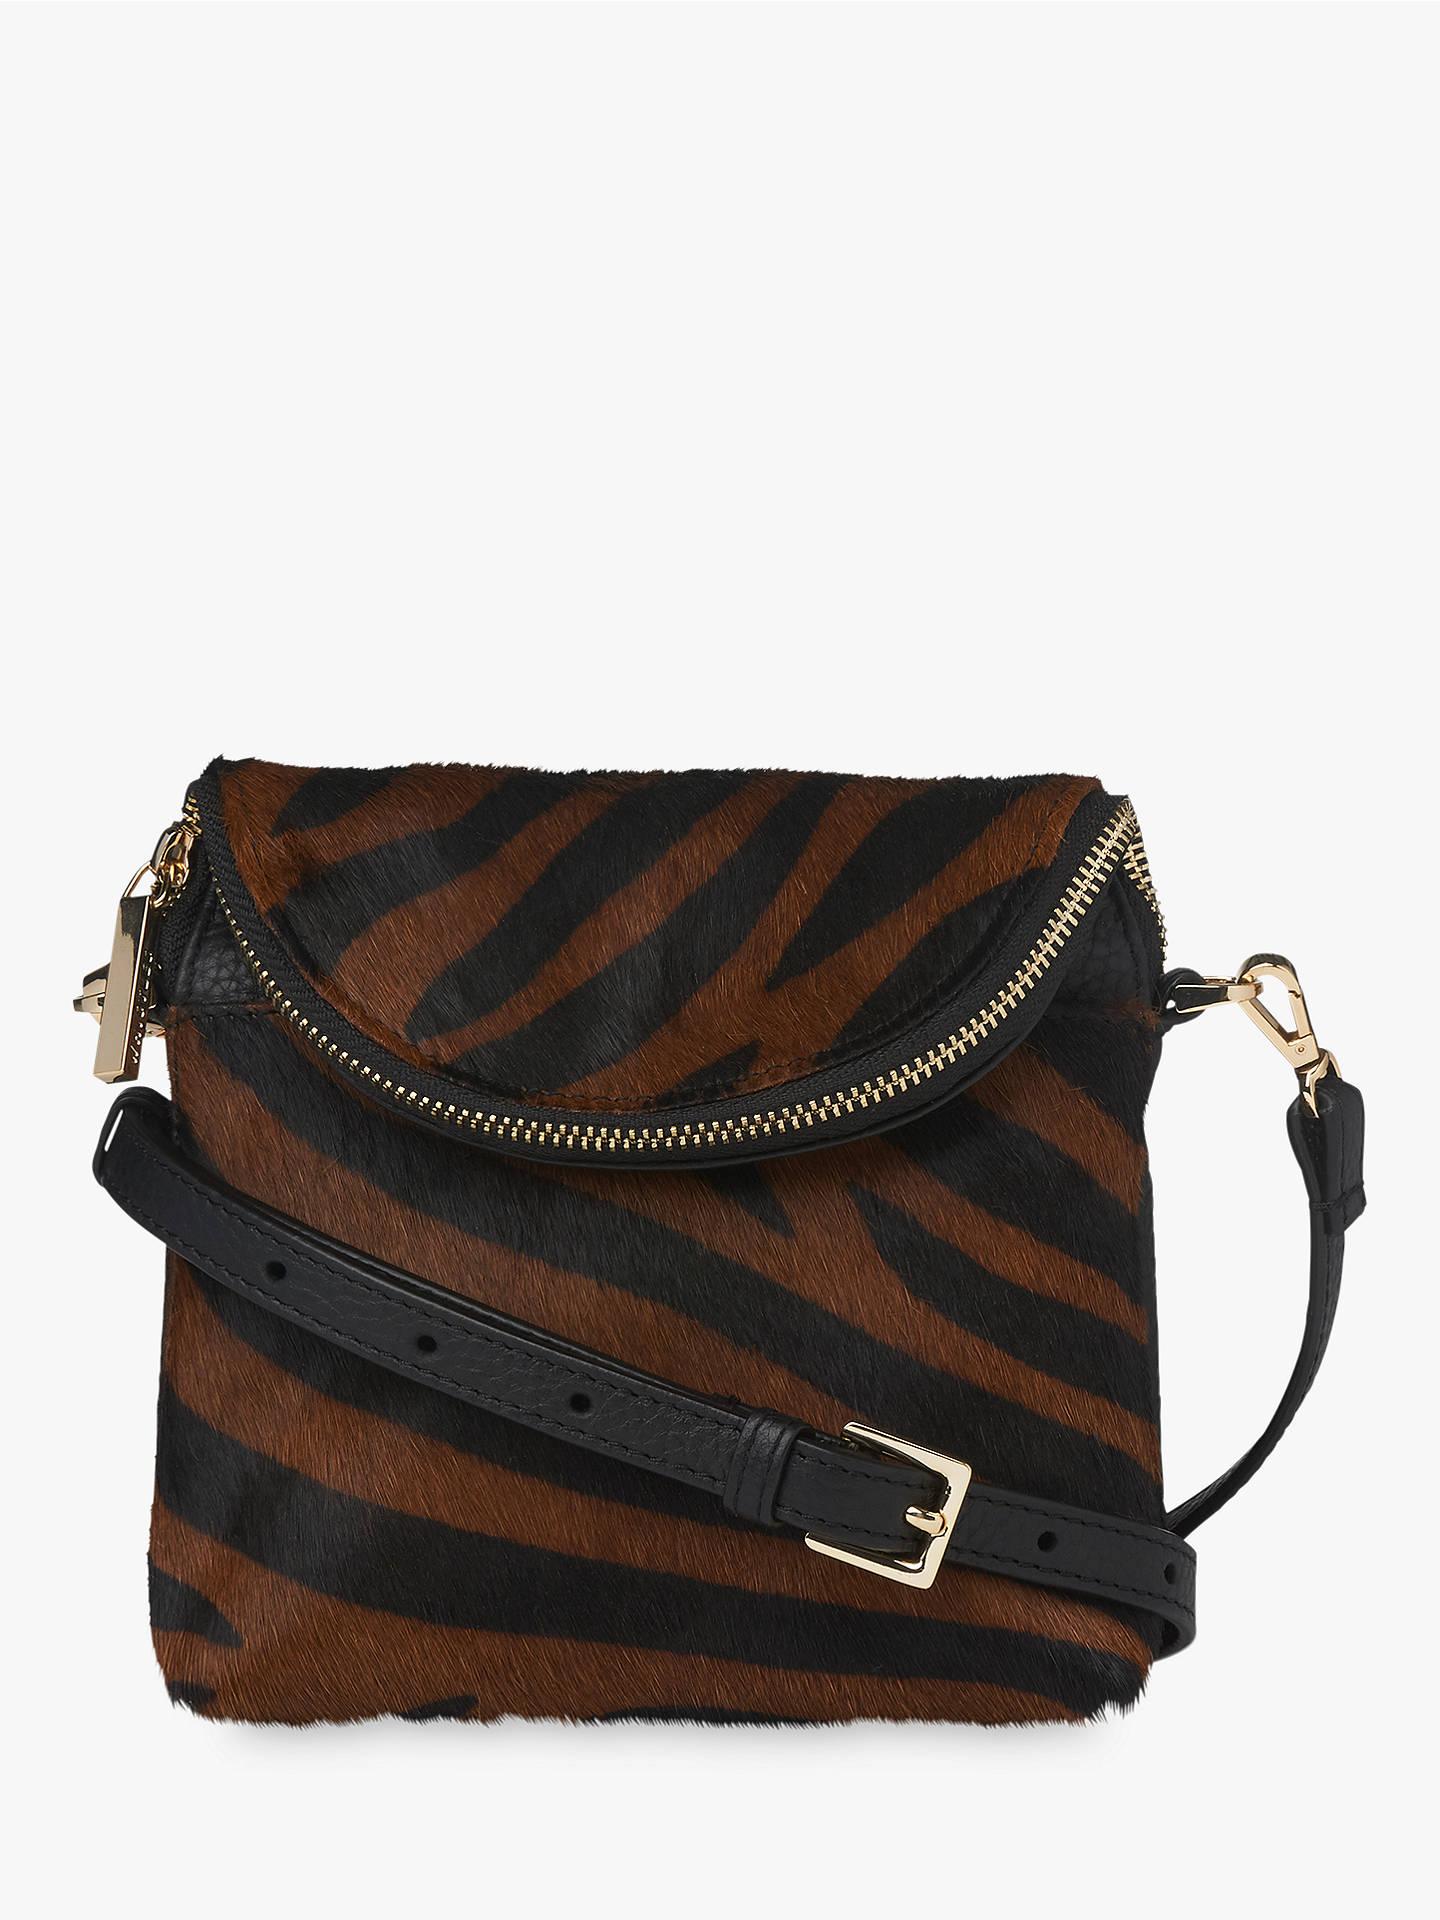 b31905229f51 BuyWhistles Victoria Mini Cross Body Bag